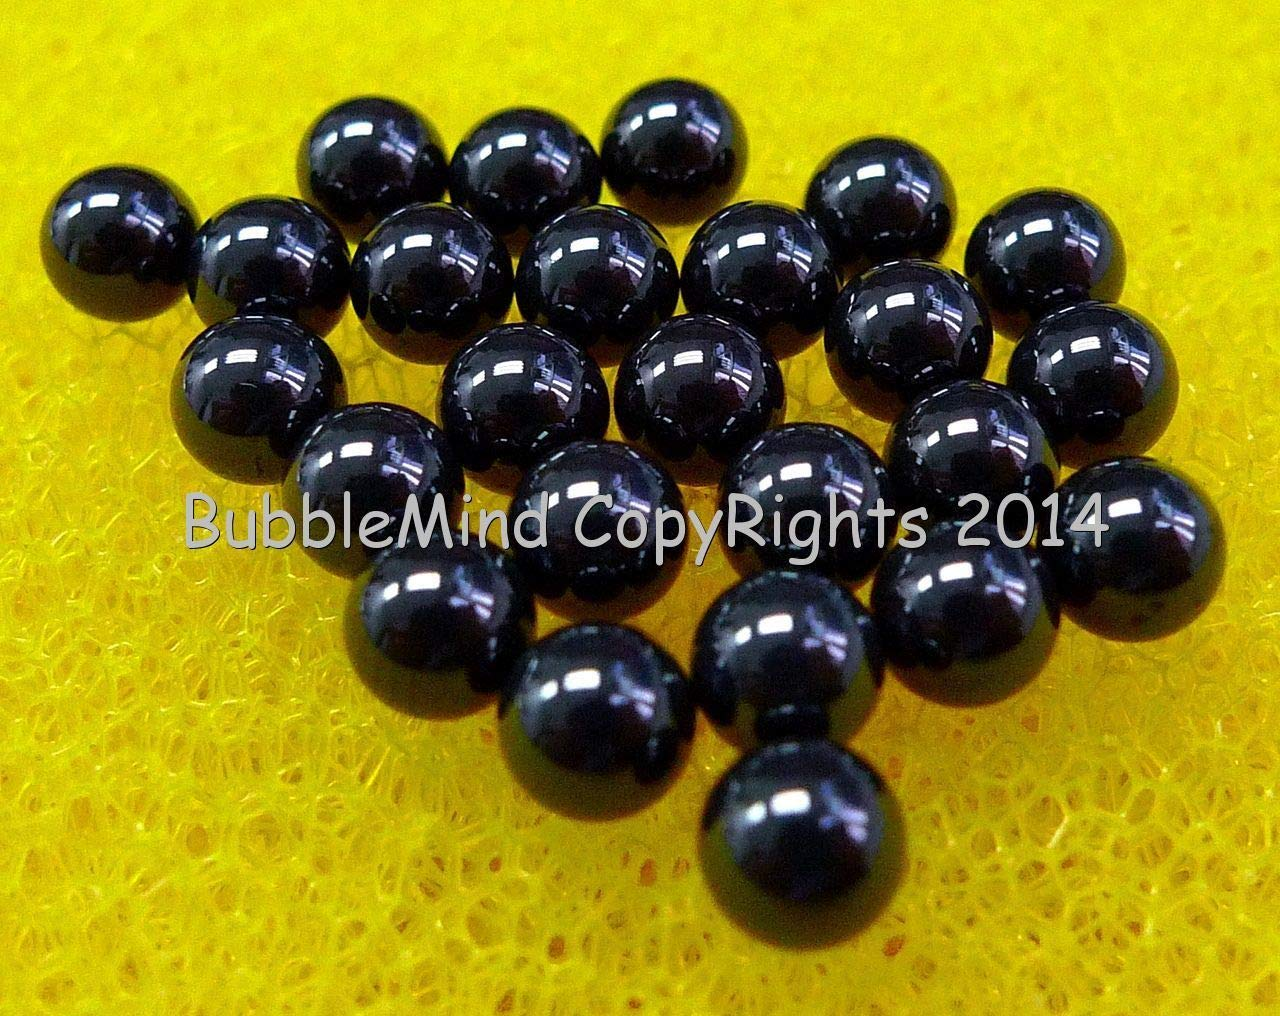 20 PCS 1.2mm Si3N4 Bearing Ball Ceramic Silicon Nitride Bearing Ball G5